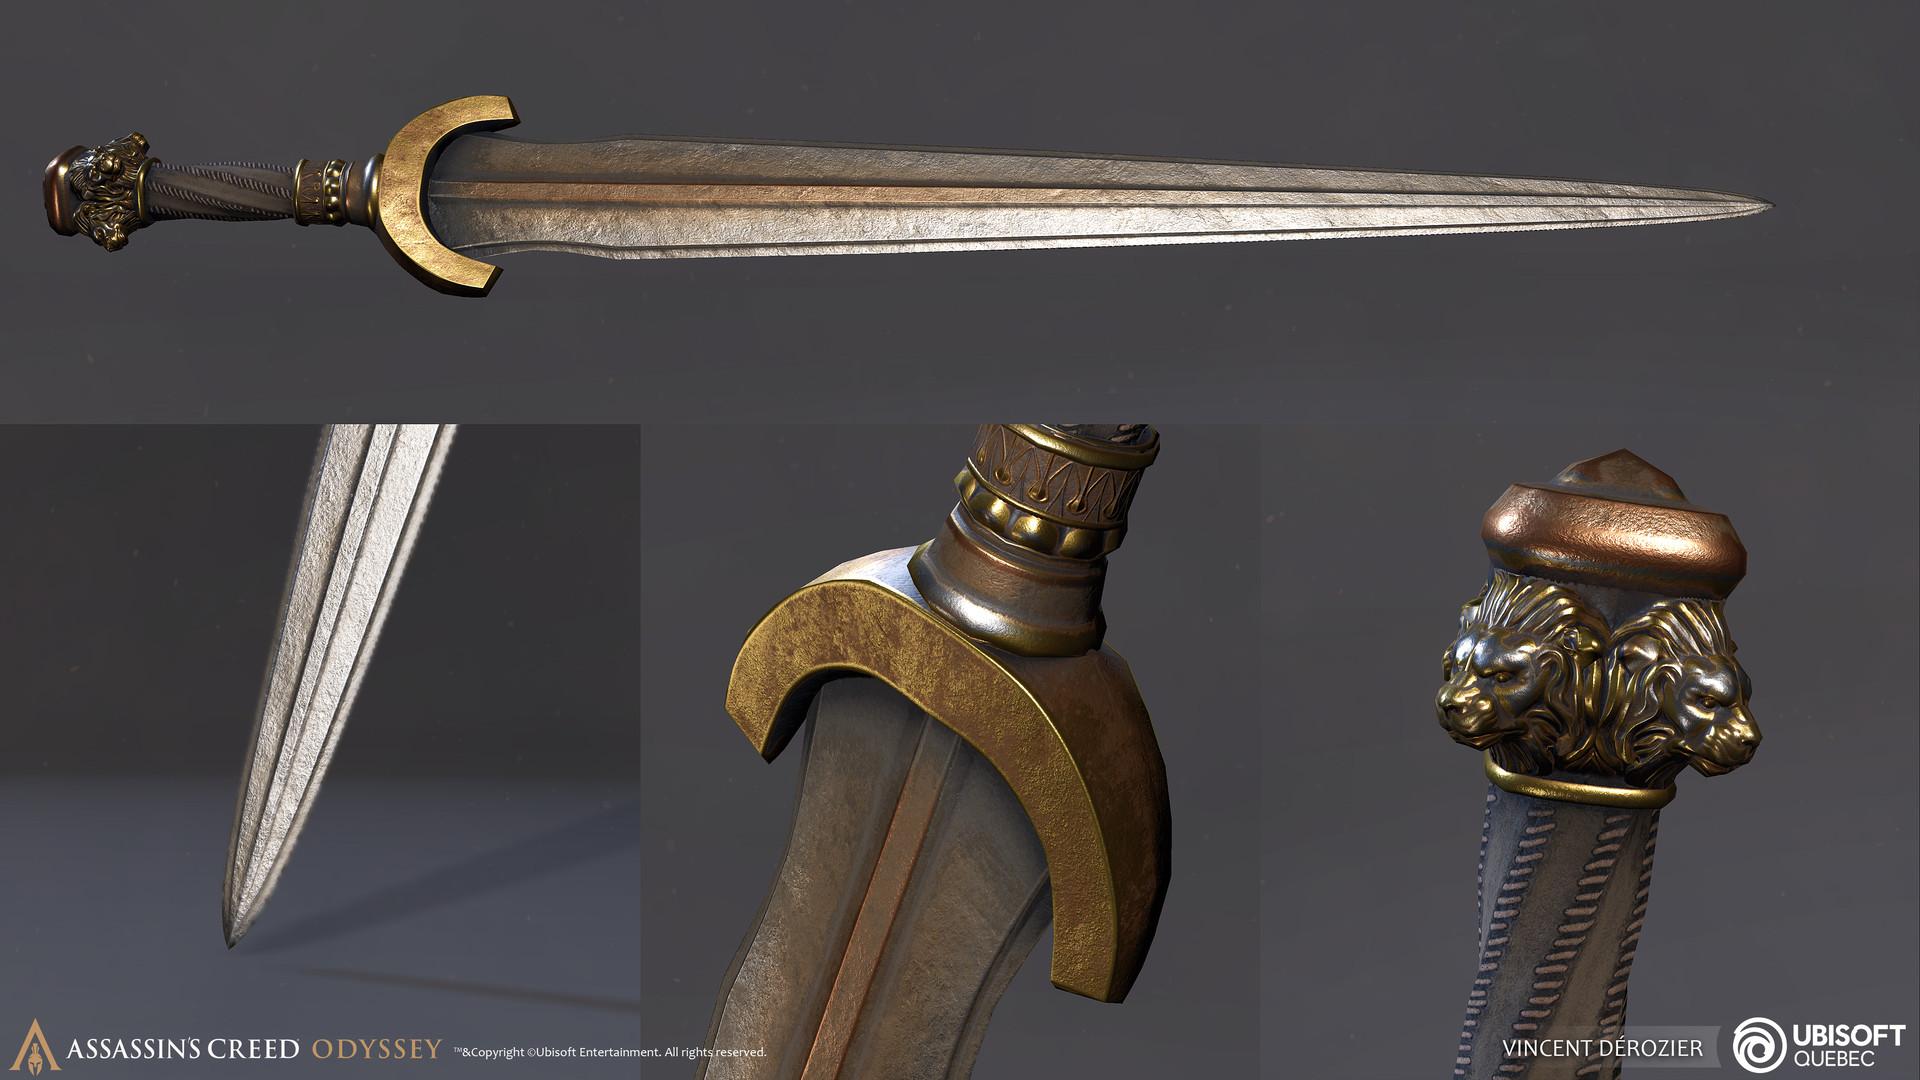 Vincent derozier props sword 3